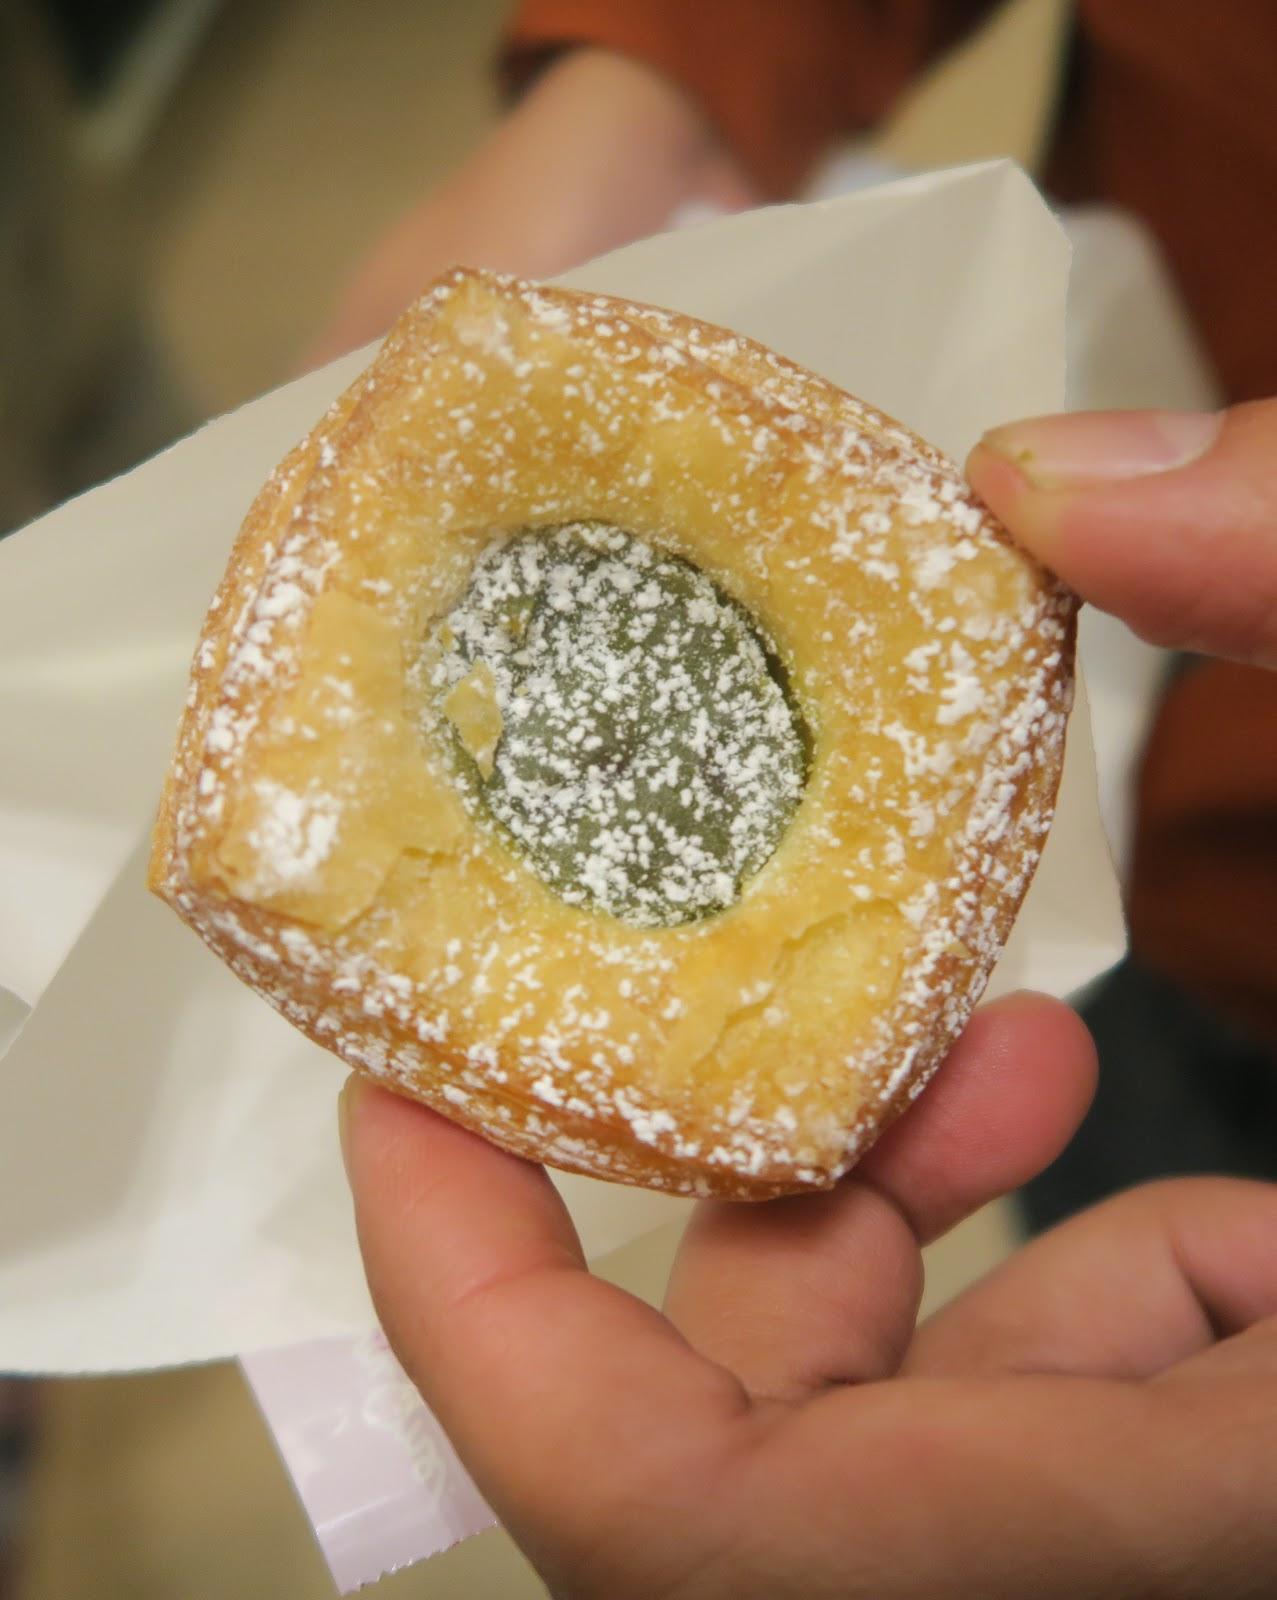 japanese food french kinokuniya